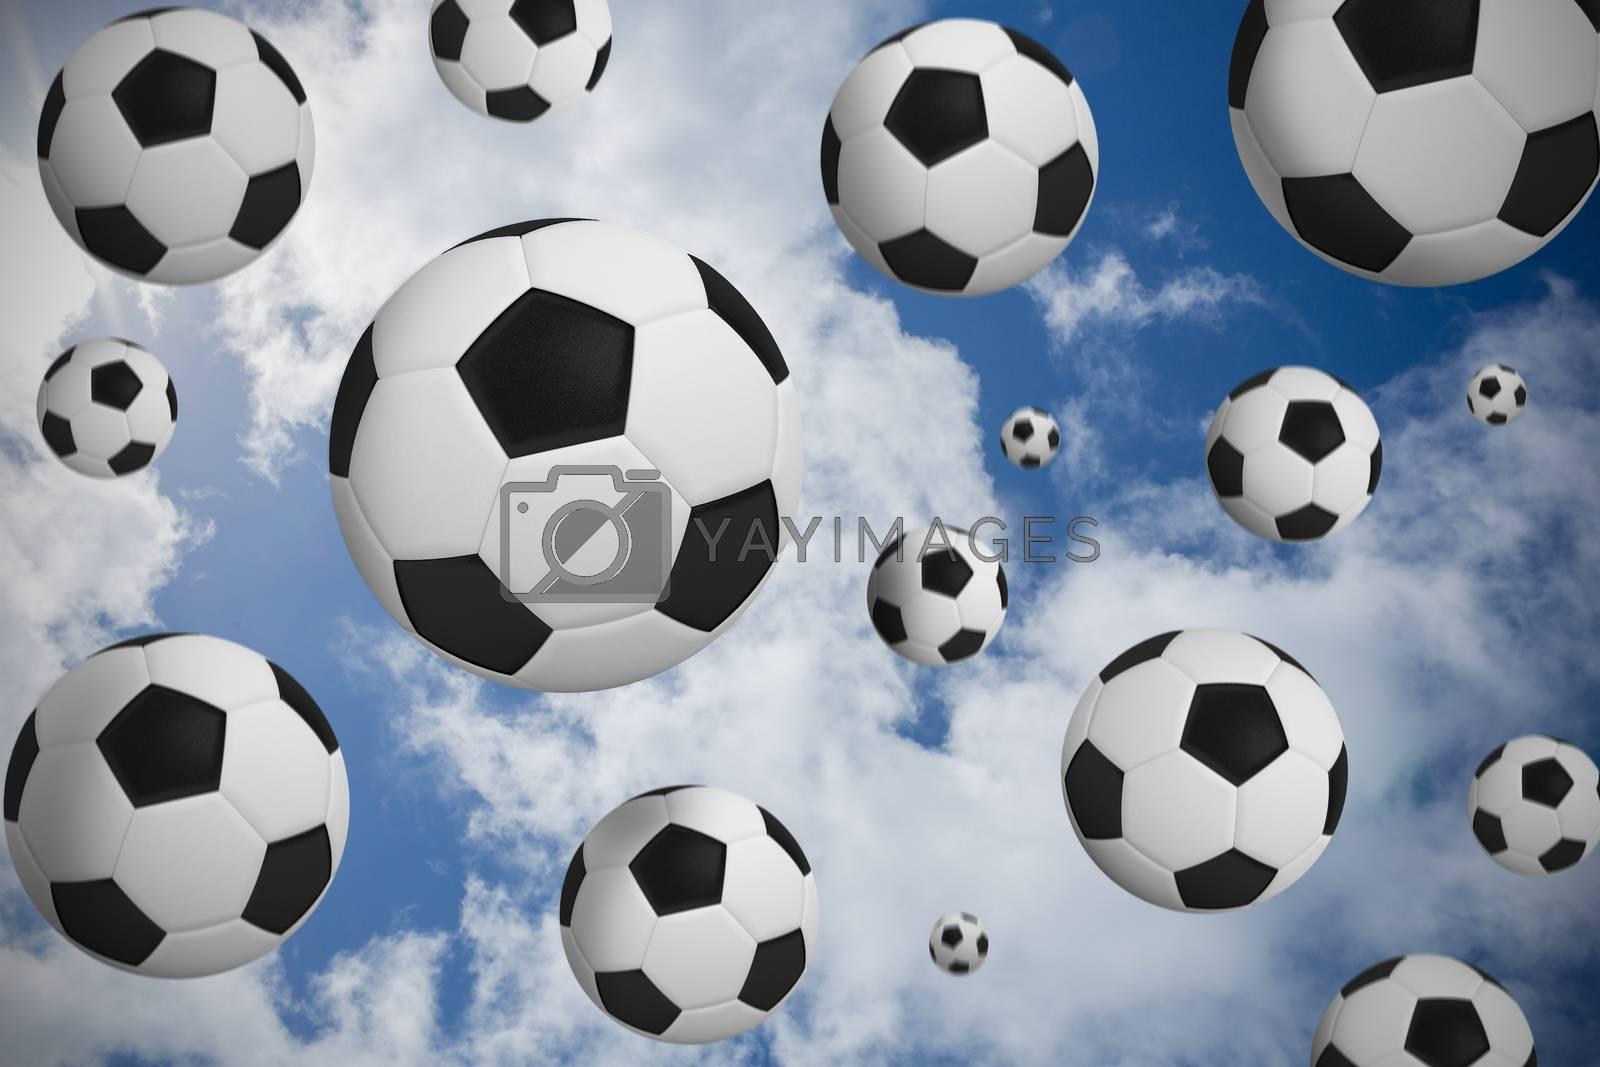 Black and white footballs by Wavebreakmedia